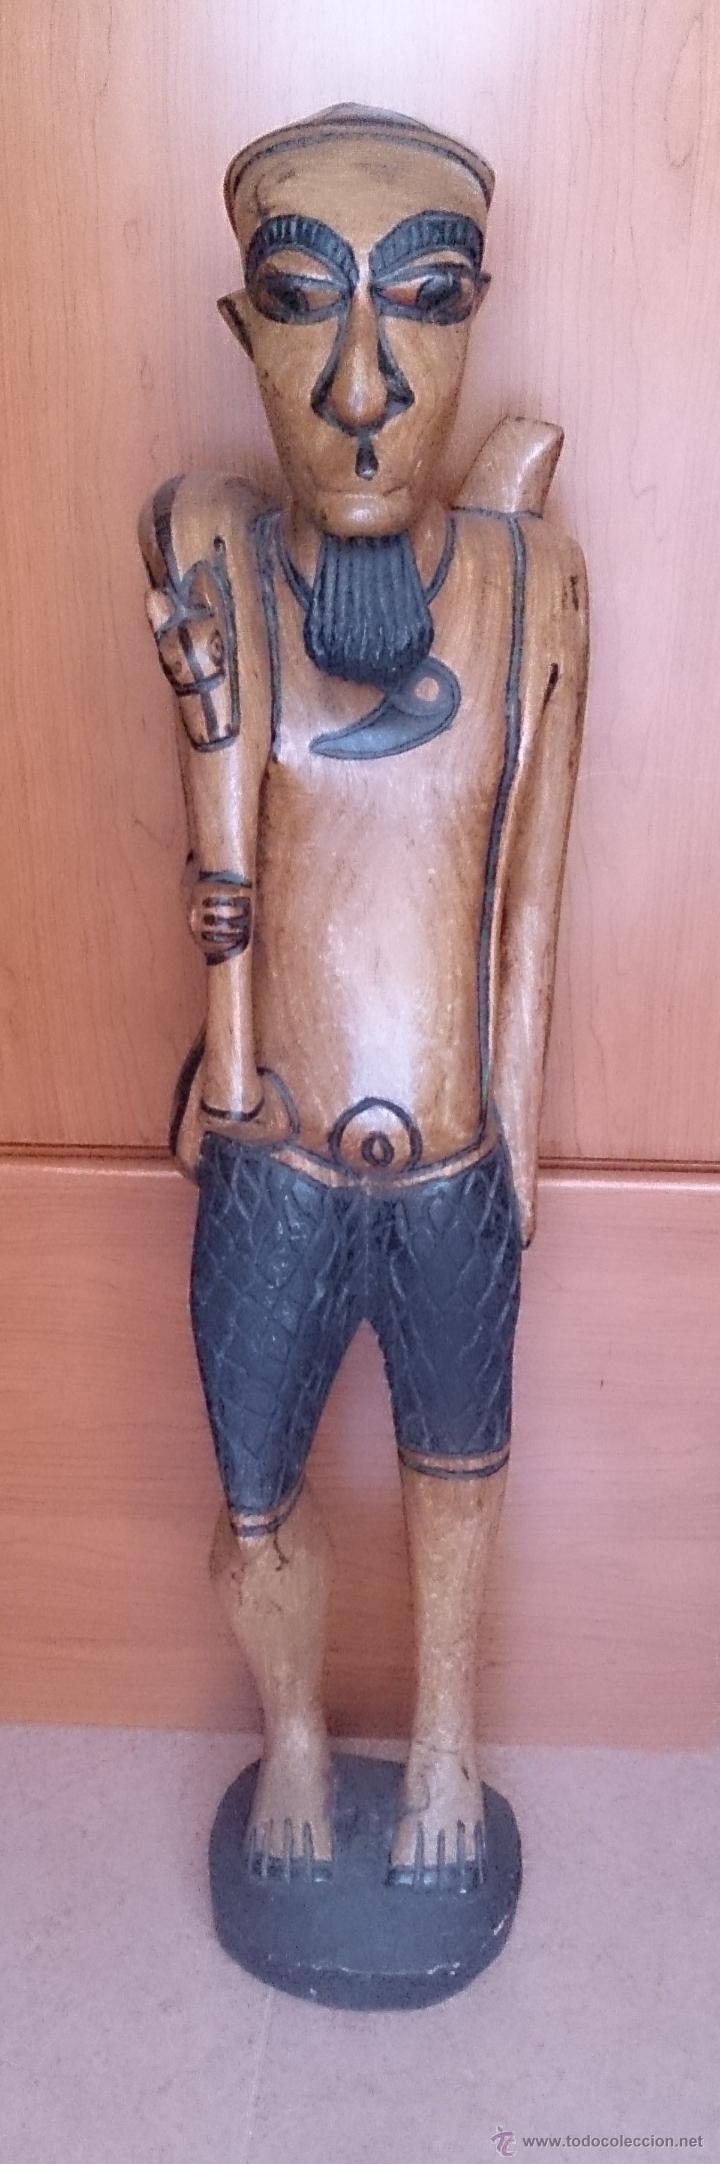 Arte: Gran talla indígena en madera maciza ( 91,5 CM DE ALTO ) . - Foto 8 - 43242684